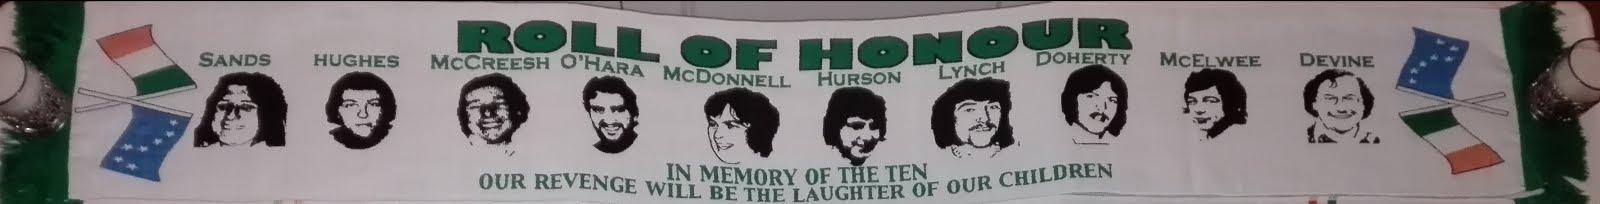 Bufanda 'Roll of Honour' - Huelga de 1981 - 14,80€